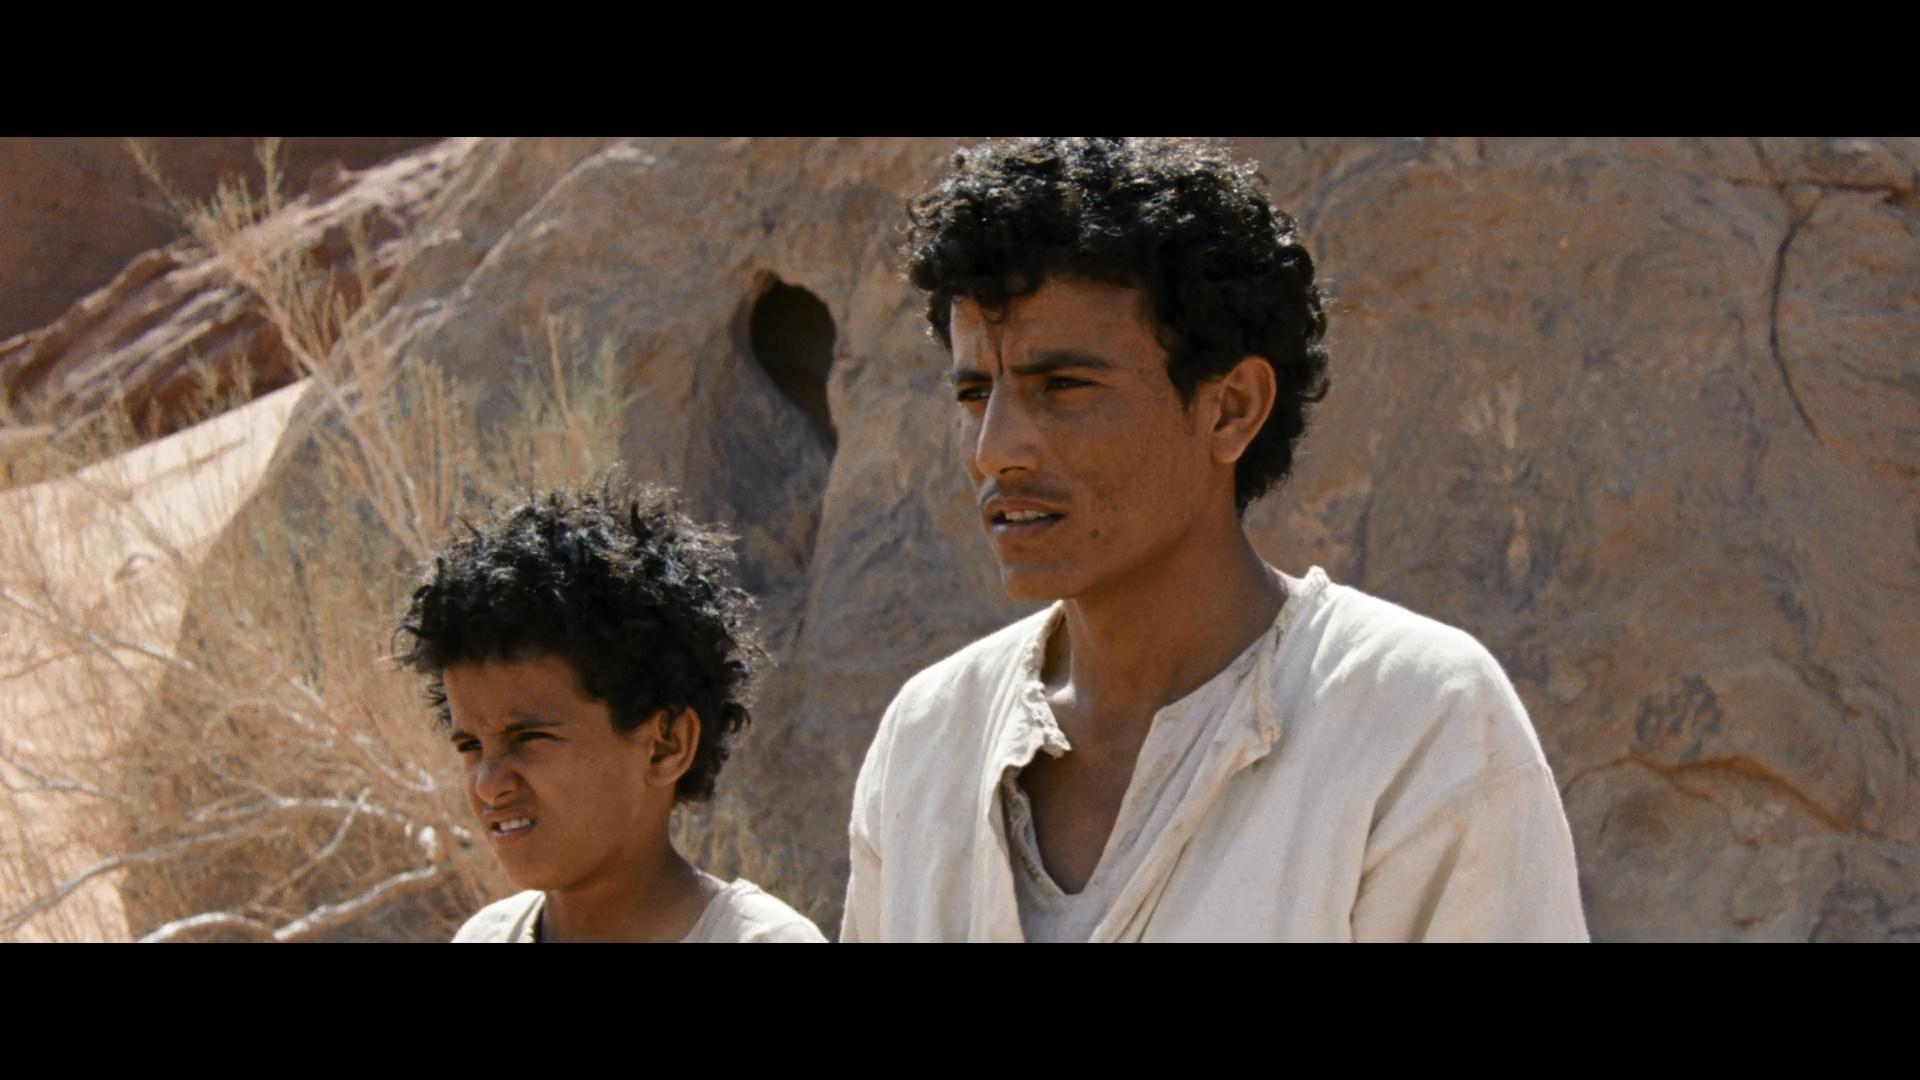 [فيلم][تورنت][تحميل][ذيب][2014][1080p][Web-DL] 6 arabp2p.com